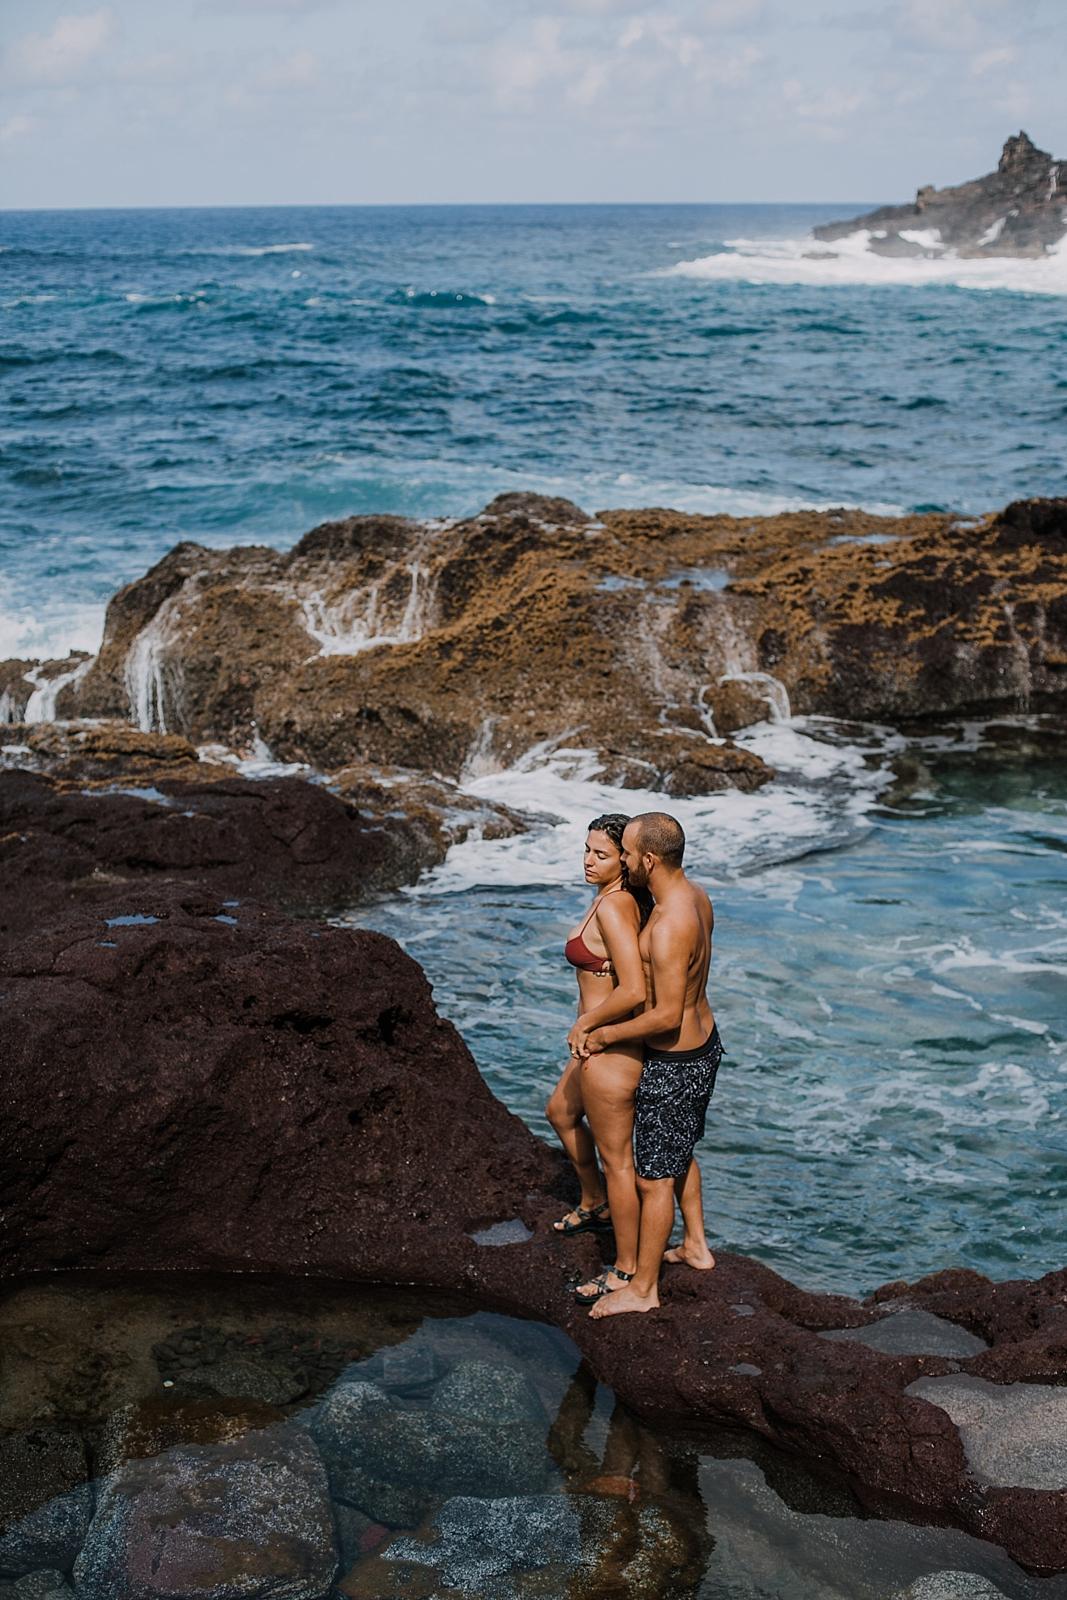 climbing in maui, maui cliffside, maui climbing, maui elopement photographer, maui wedding photographer, couple on cliffside, maui hiking, maui hawaii hiking, lahaina maui beaches, alexis russell ring